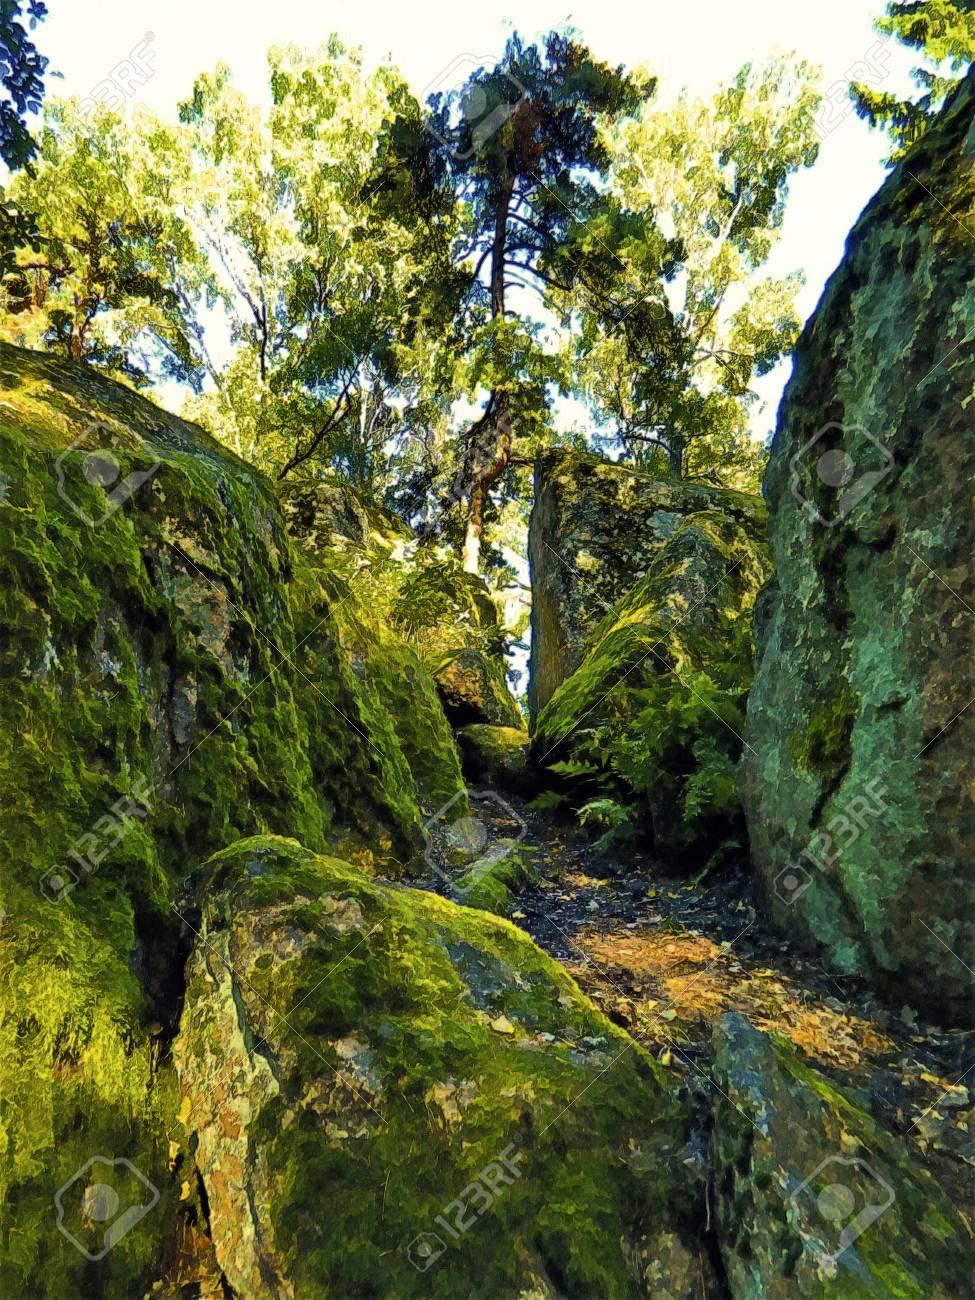 land of emerald cliffs Stock Photo - 11305720